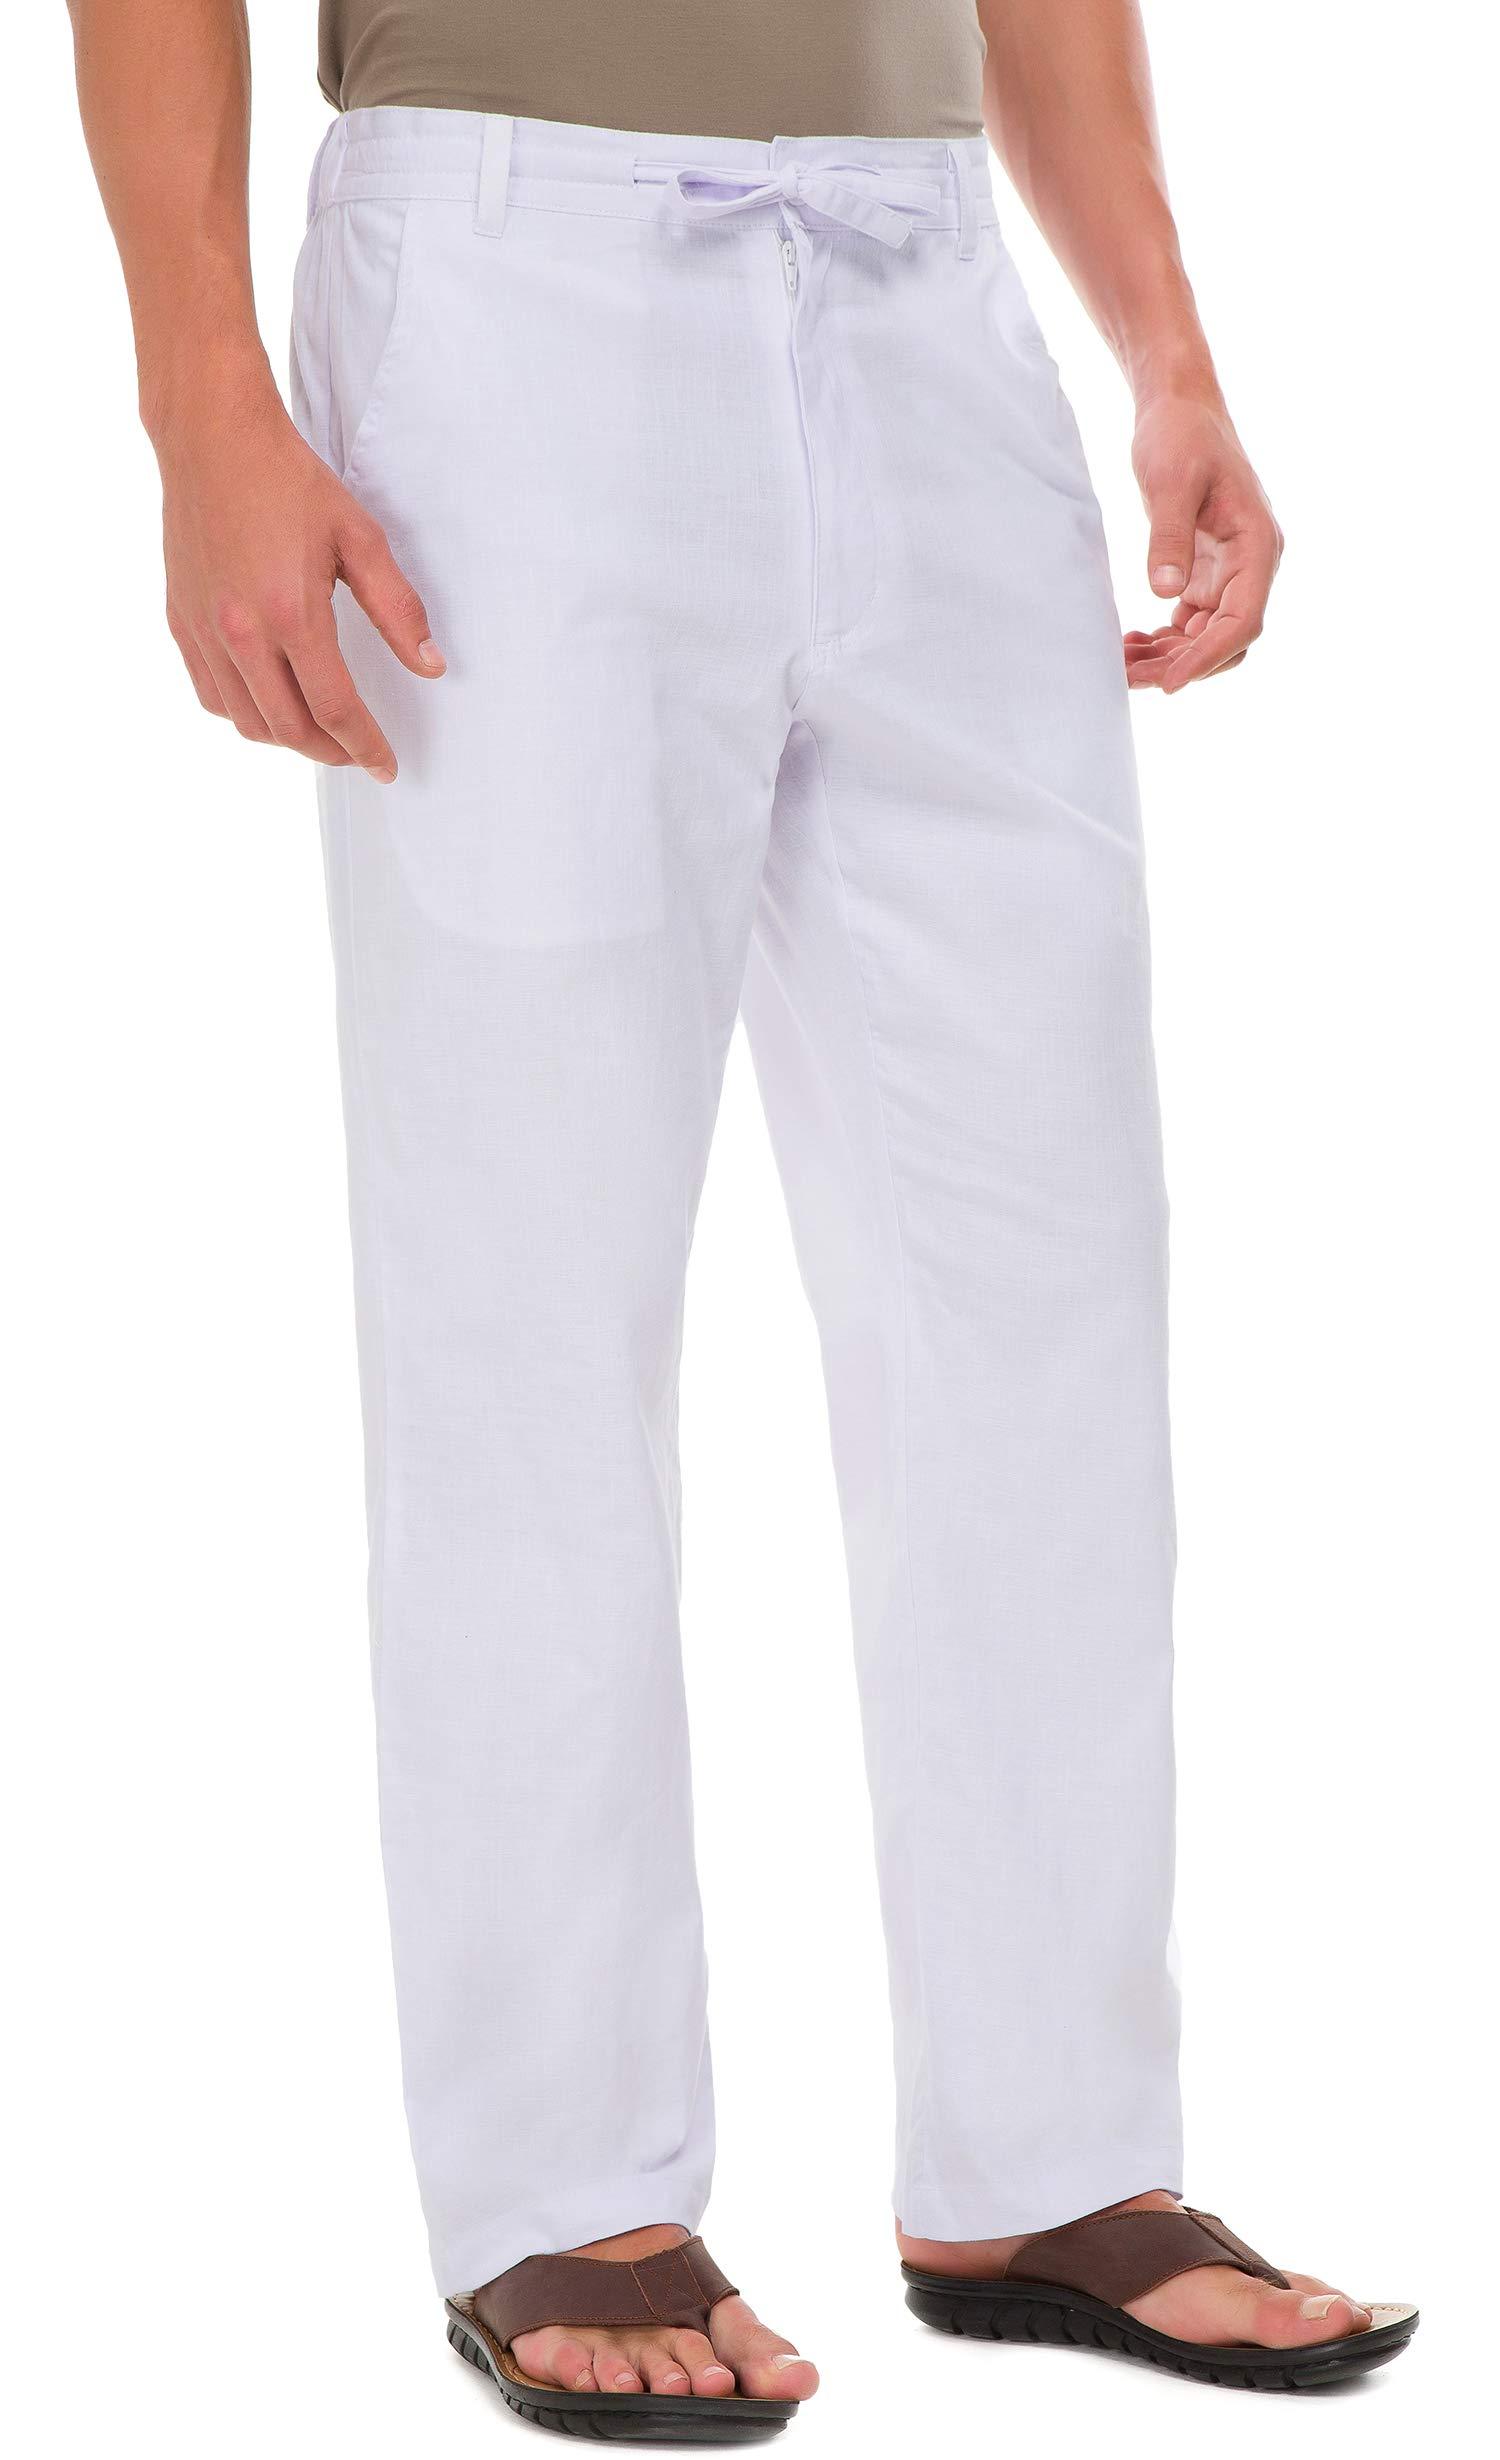 Janmid Men Casual Beach Trousers Linen Summer Pants White 2XL